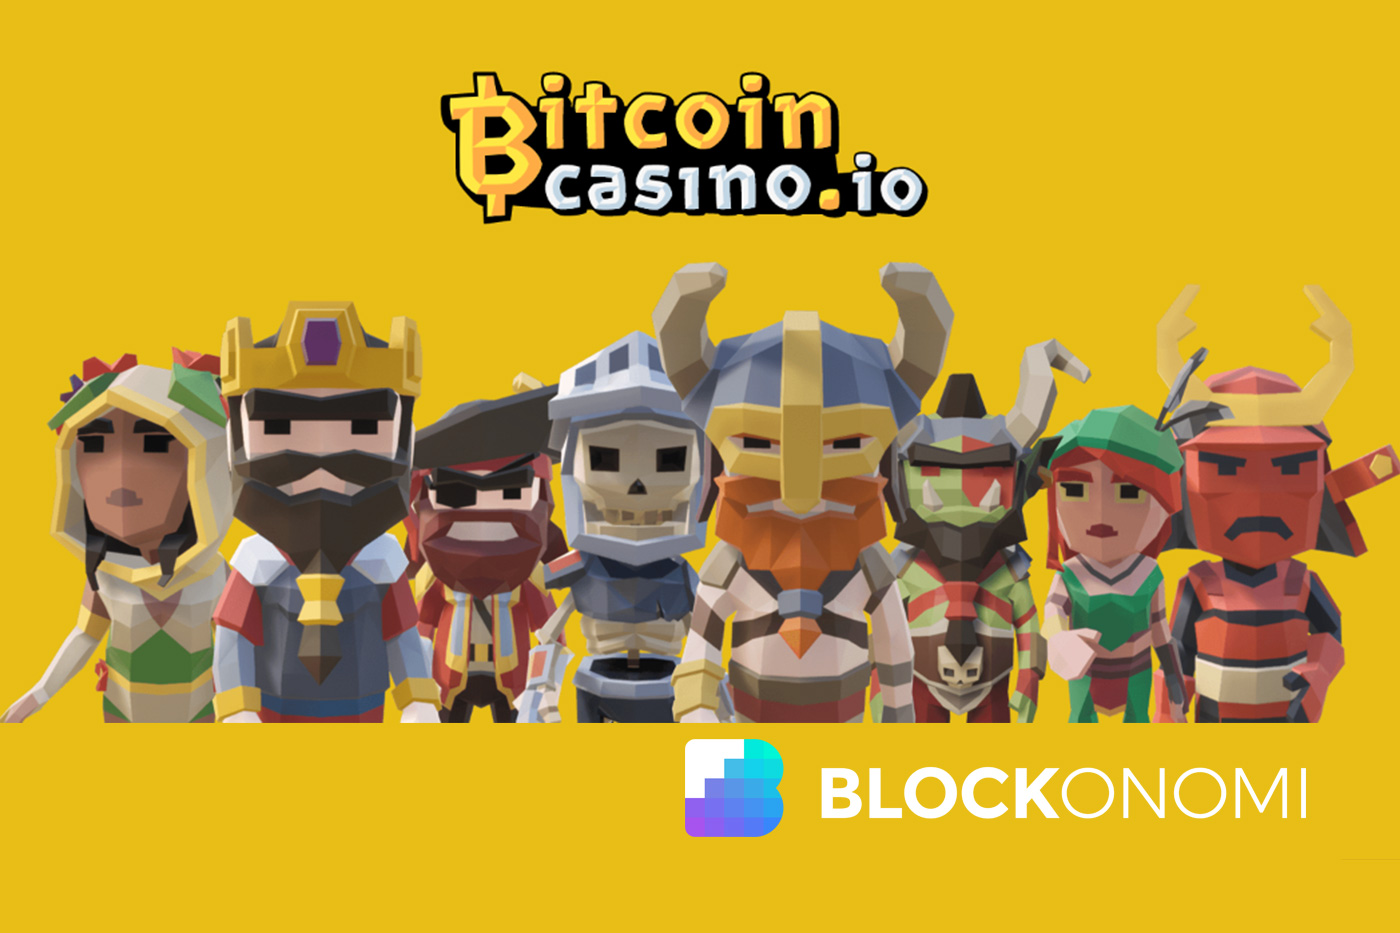 Free bitcoin casino tournaments